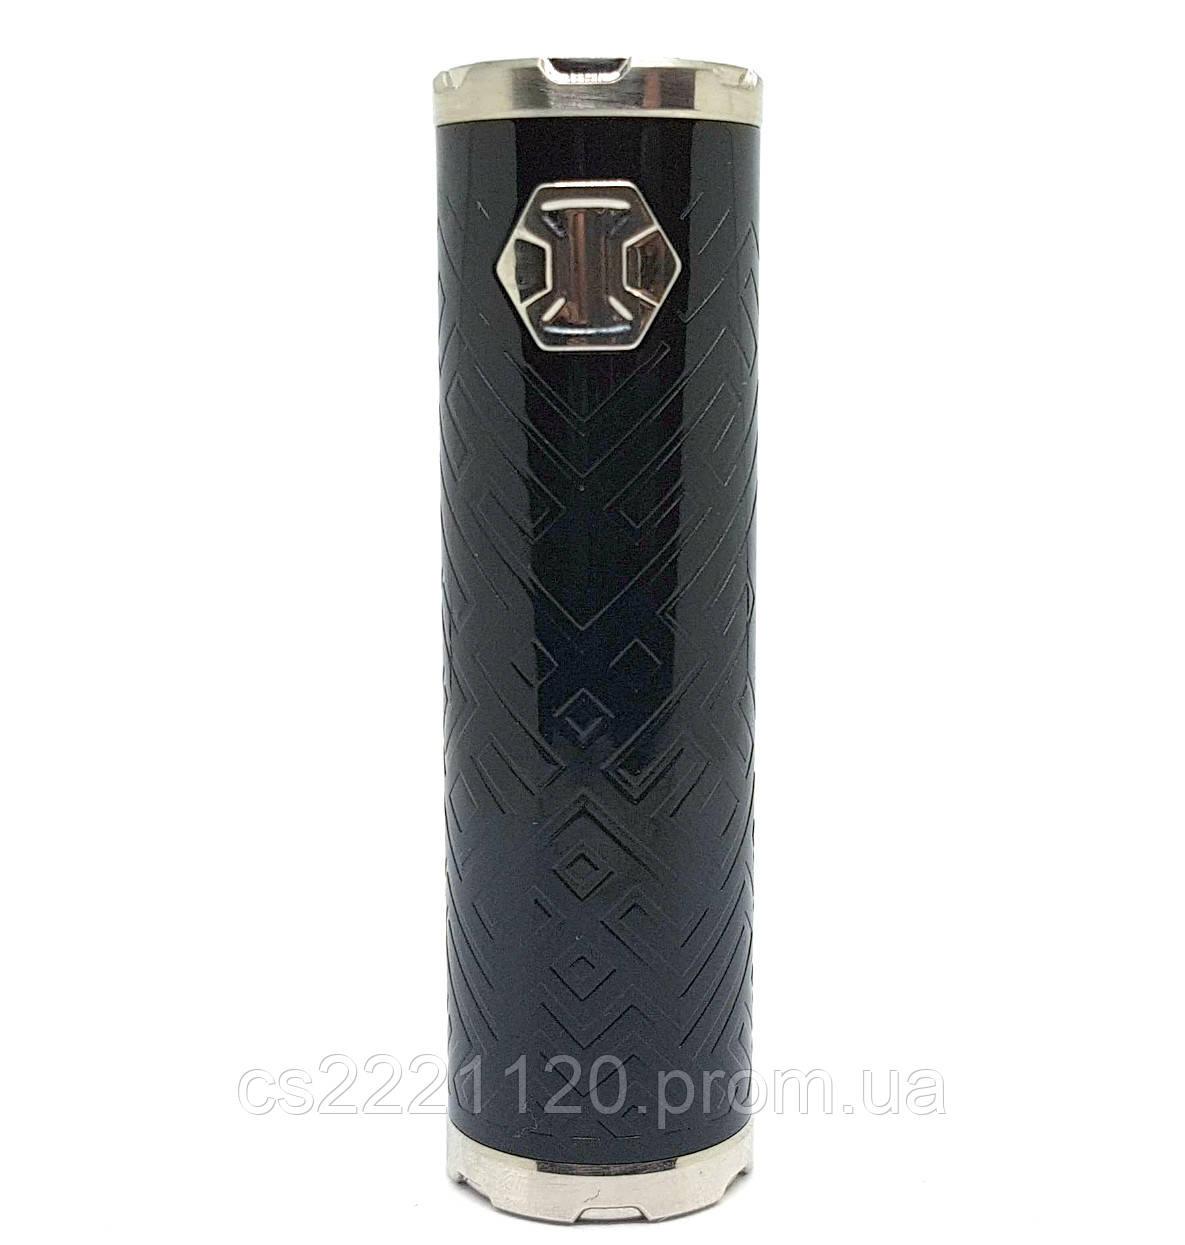 Акумулятор Eleaf iJust 3 Battery 3000mAh (чорний)